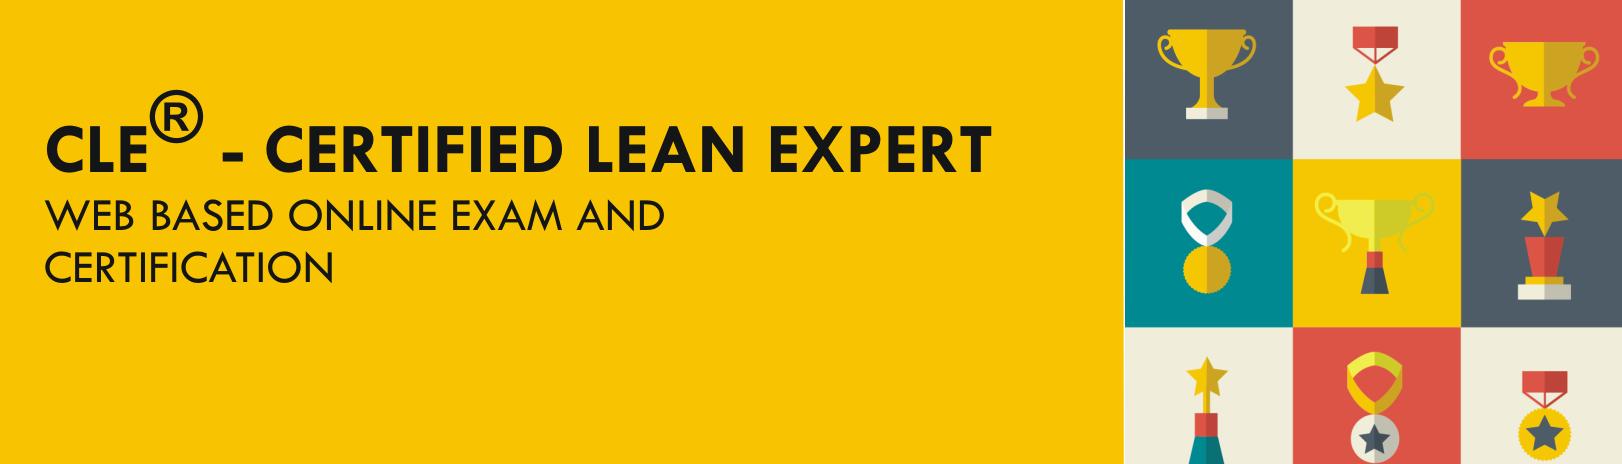 Lean Certification | Lean Concepts | Six Sigma Concept - SKIL